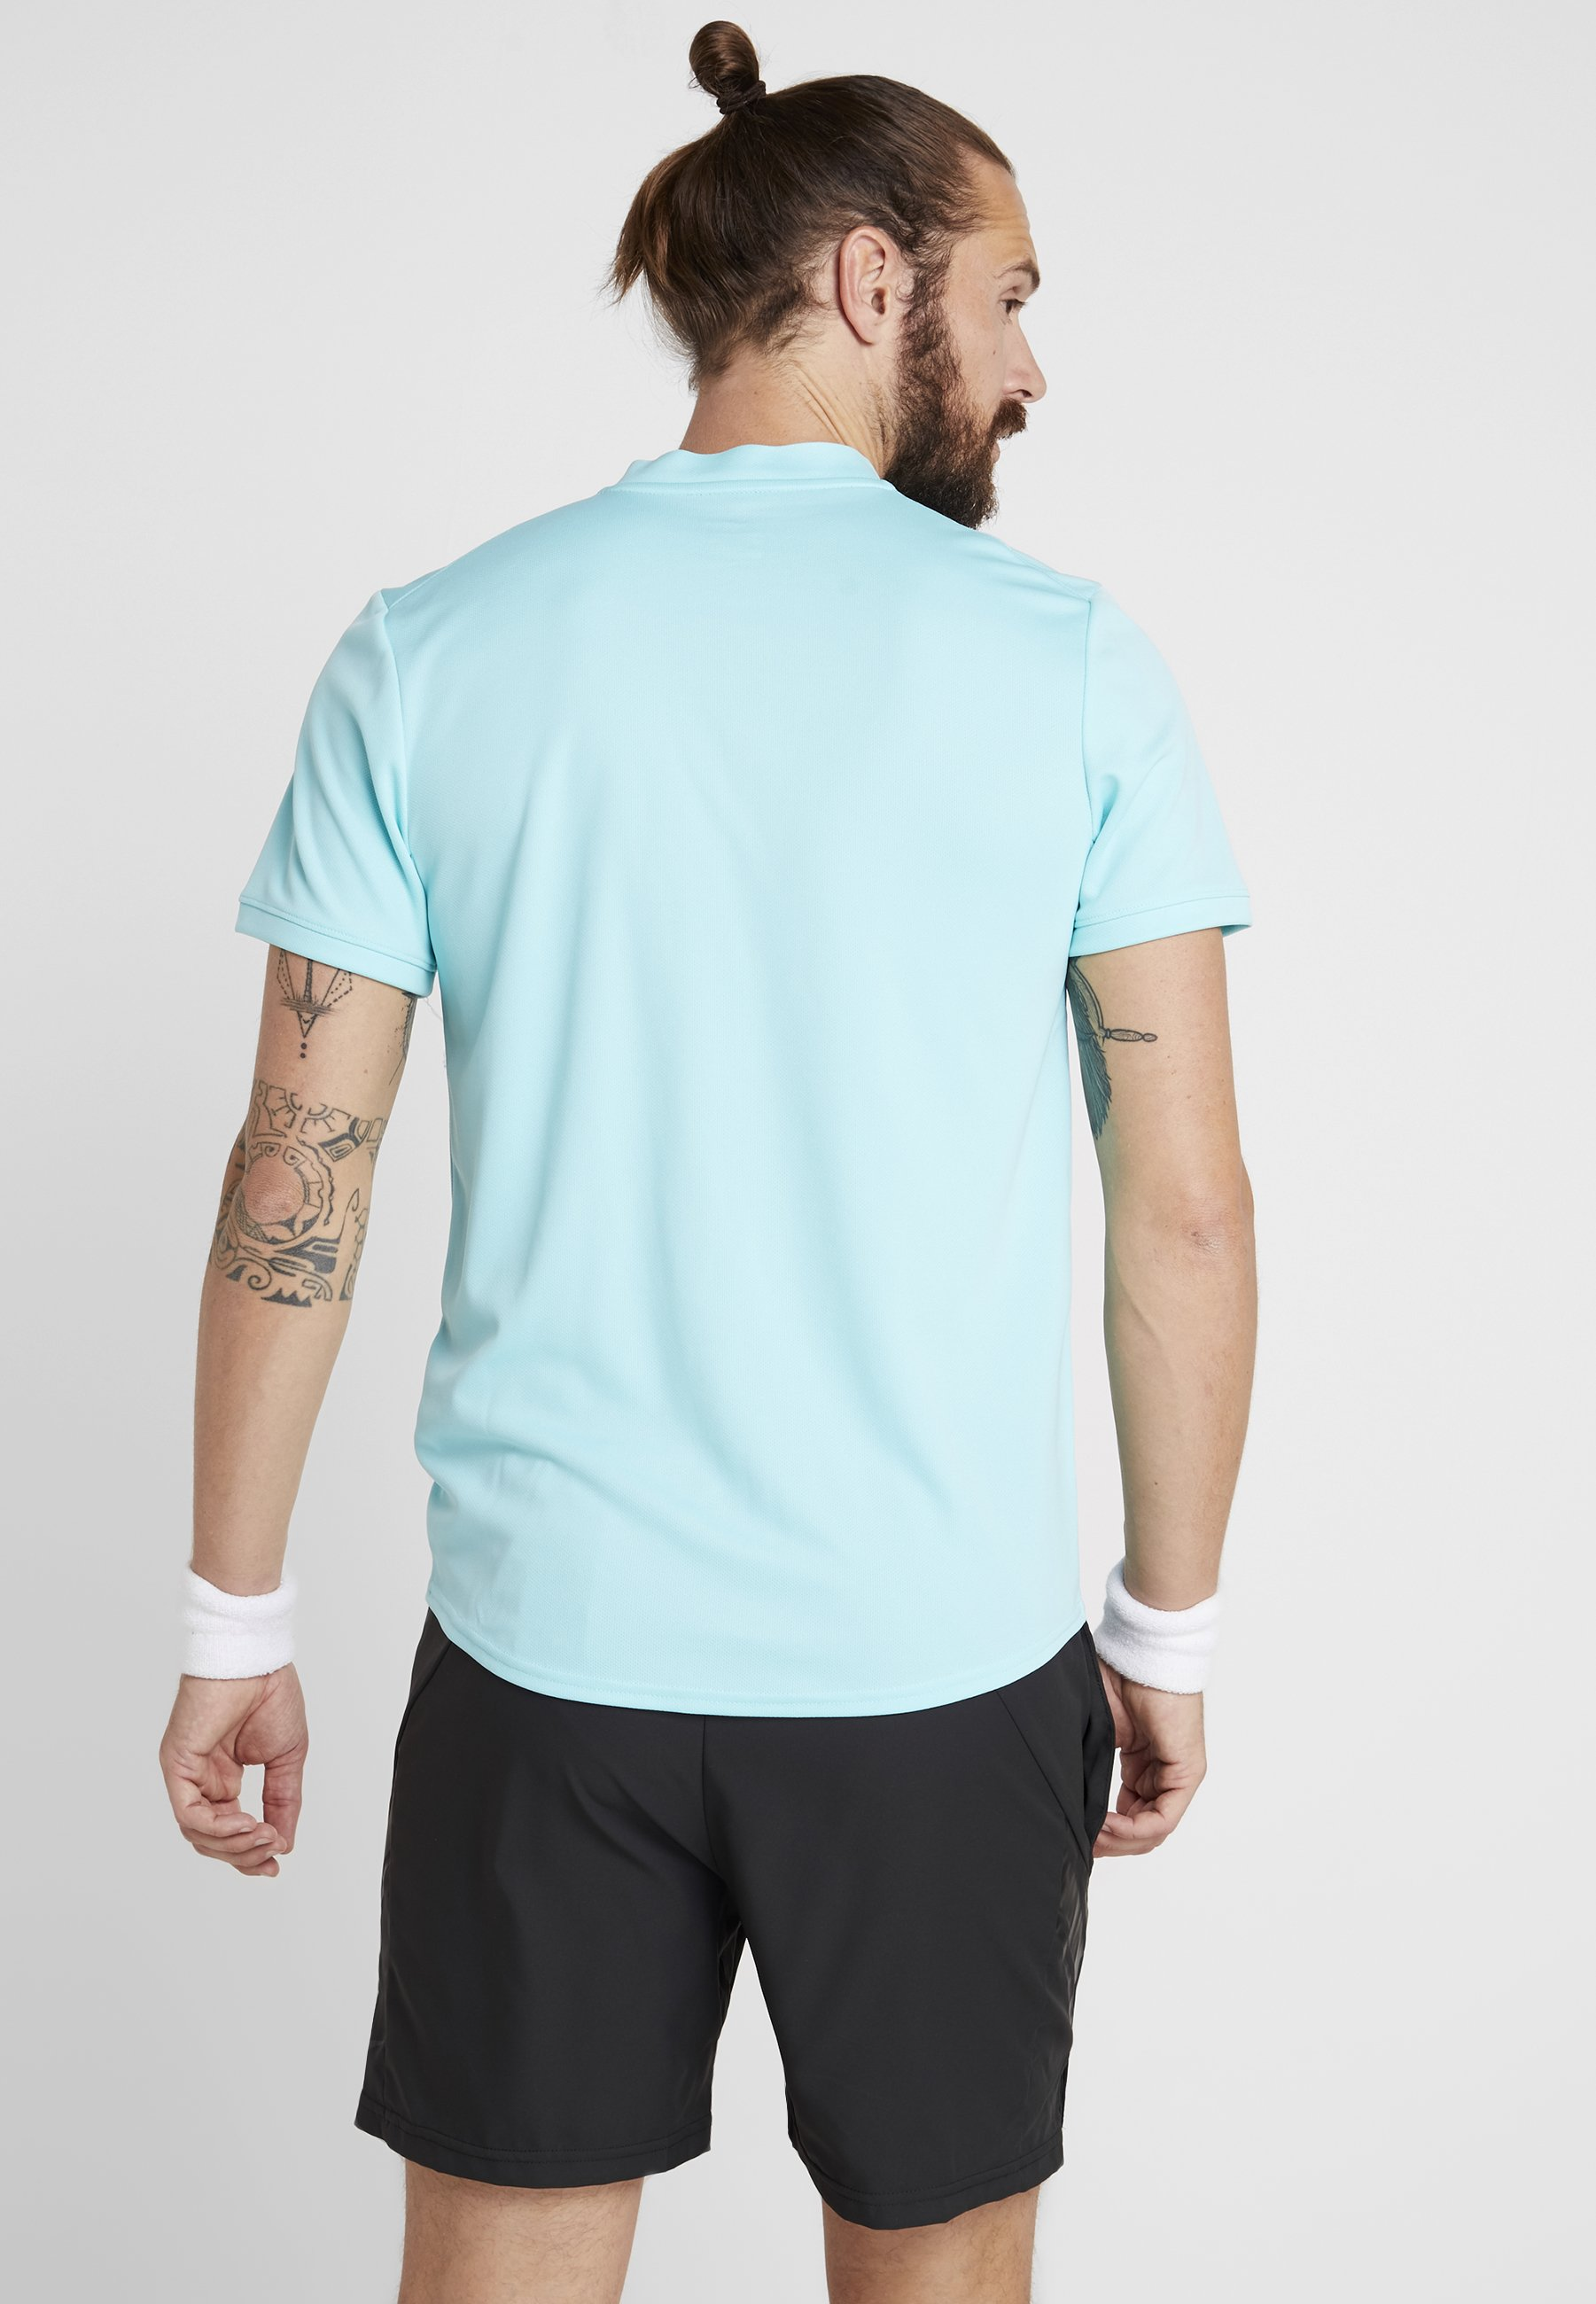 Polo Aqua Performance Dry Nike Light BladeT shirt Basique Omn0wvN8